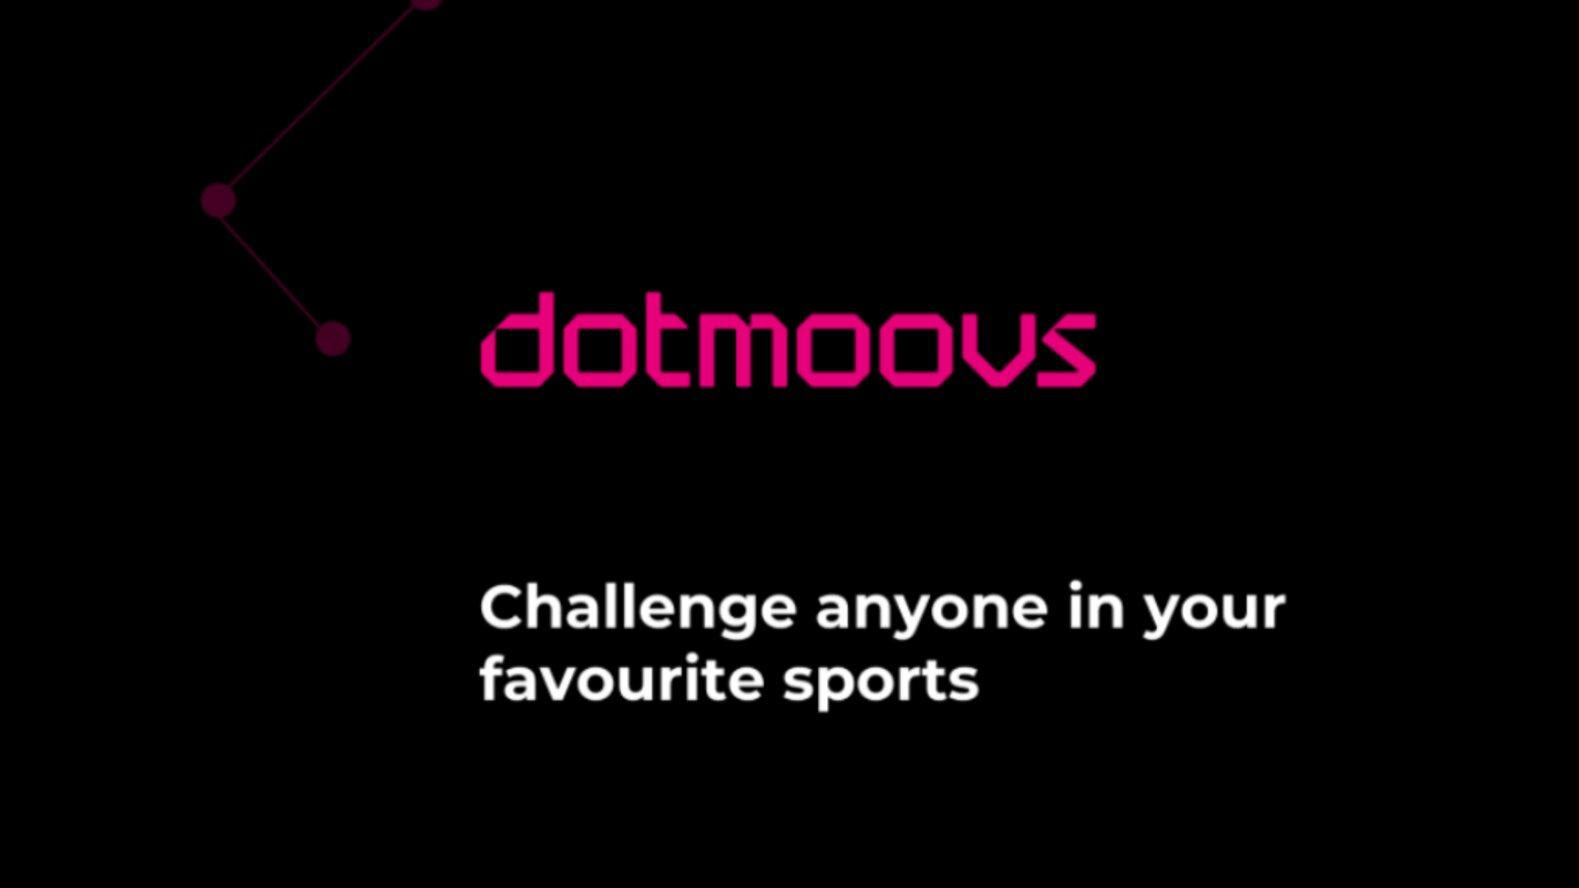 dotmoovs Set To Launch Its MVP Ahead Of Schedule